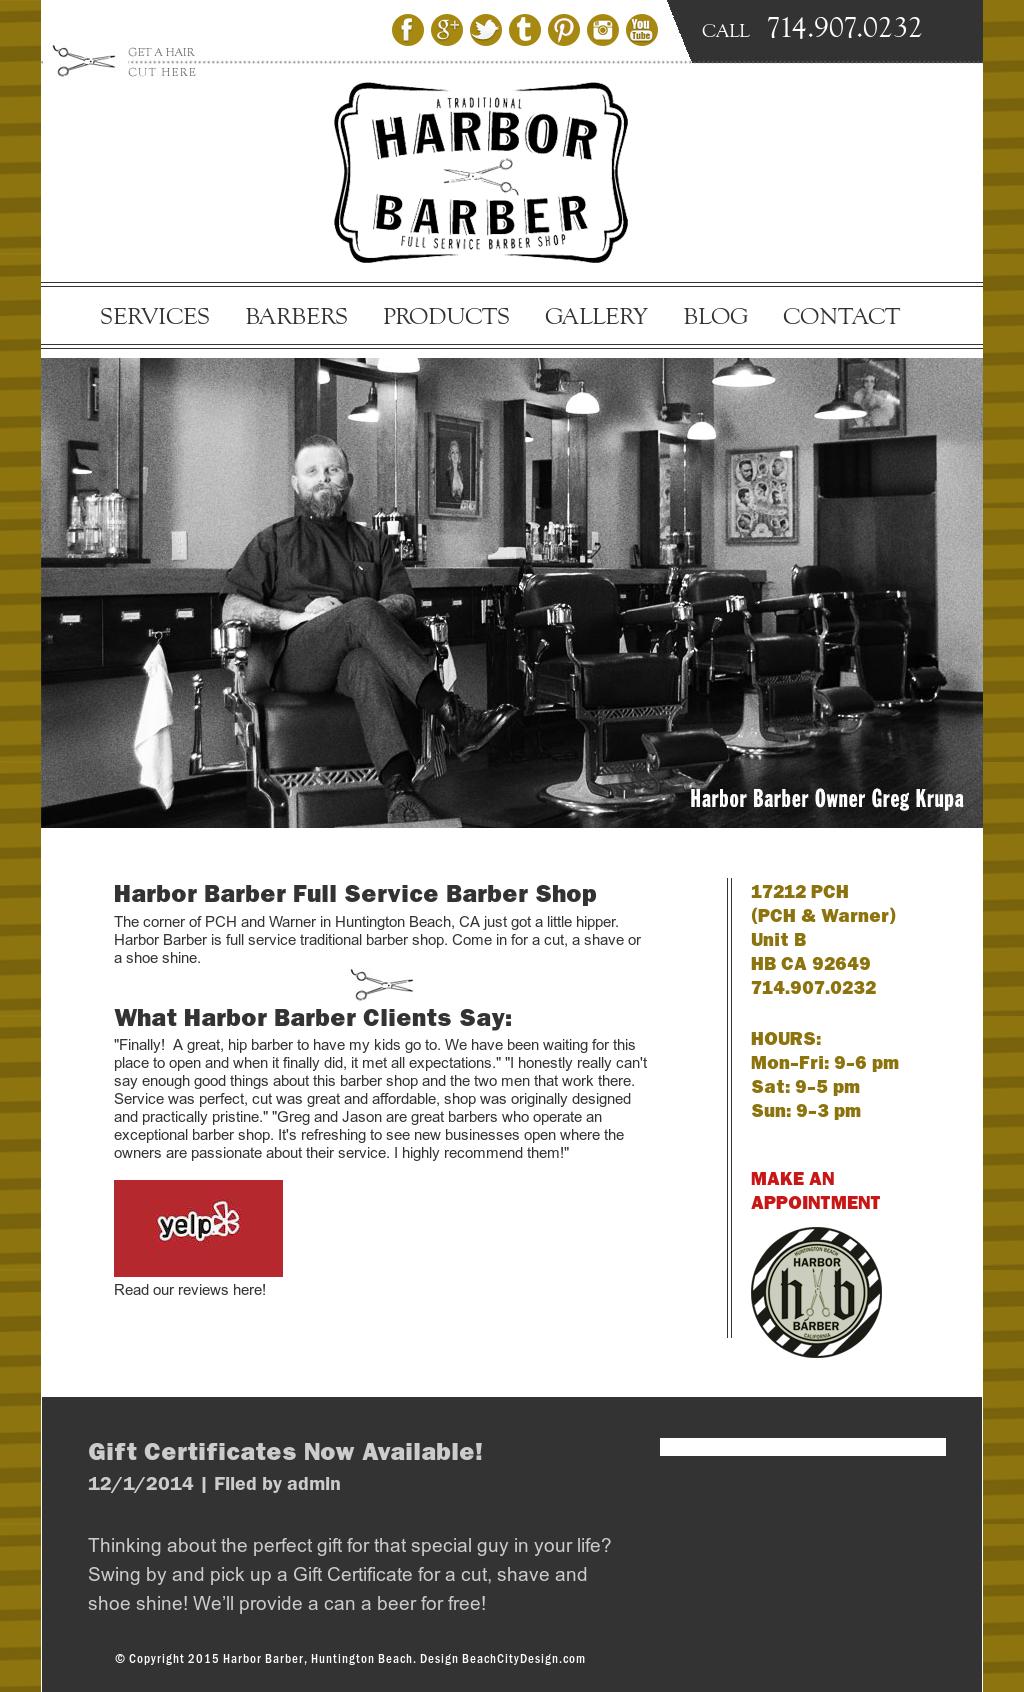 Harbor Barber - Huntington Beach, Ca Competitors, Revenue and